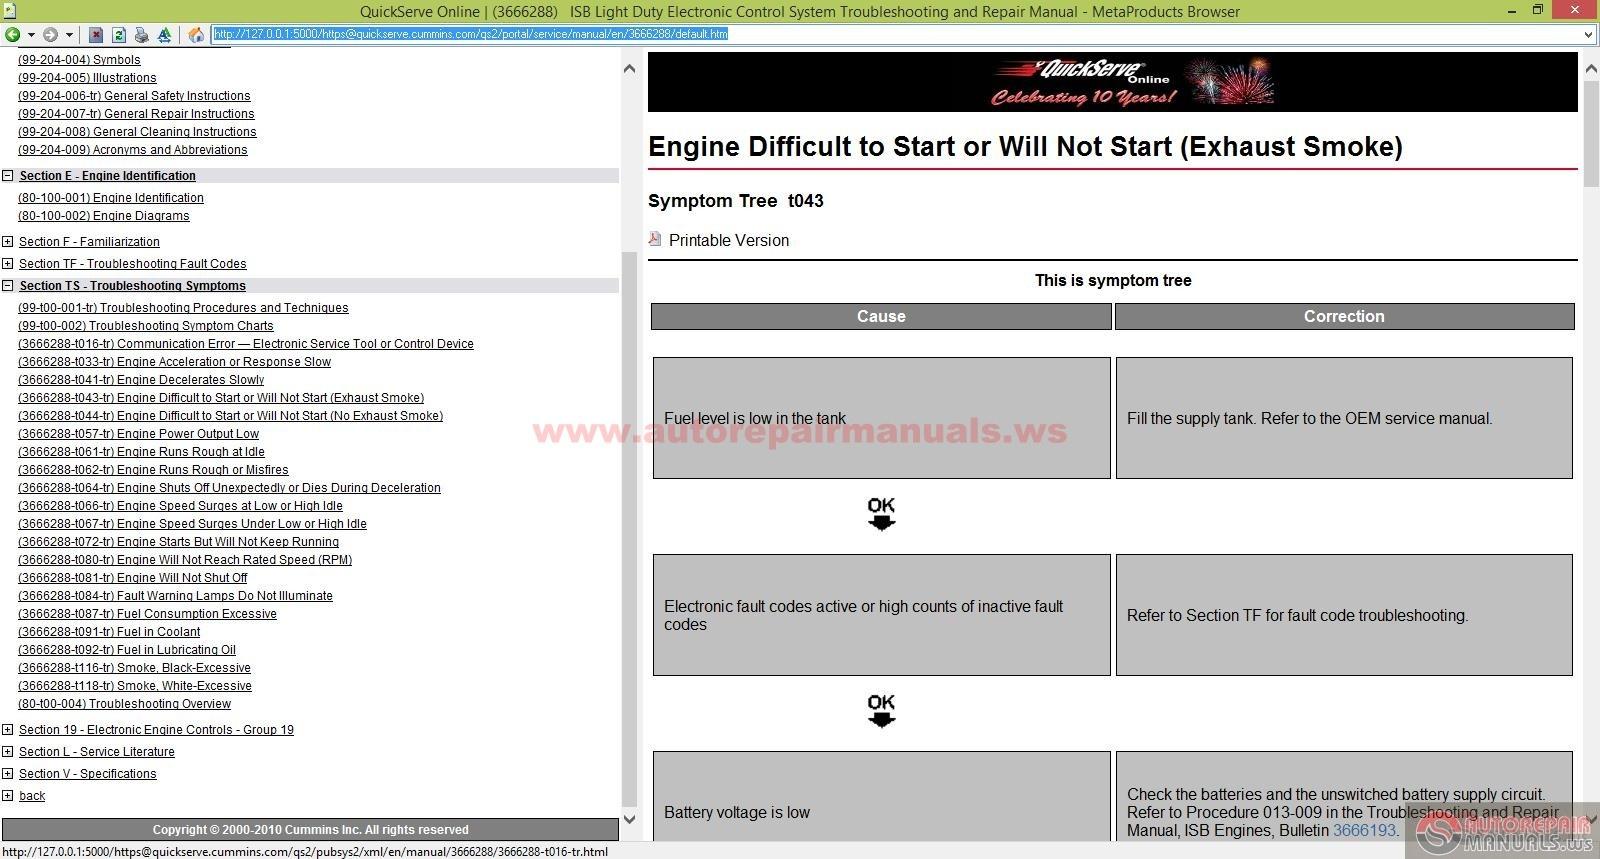 Keygen Autorepairmanuals Ws  Cummins Isb Light Duty Electronic Control System Troubleshooting